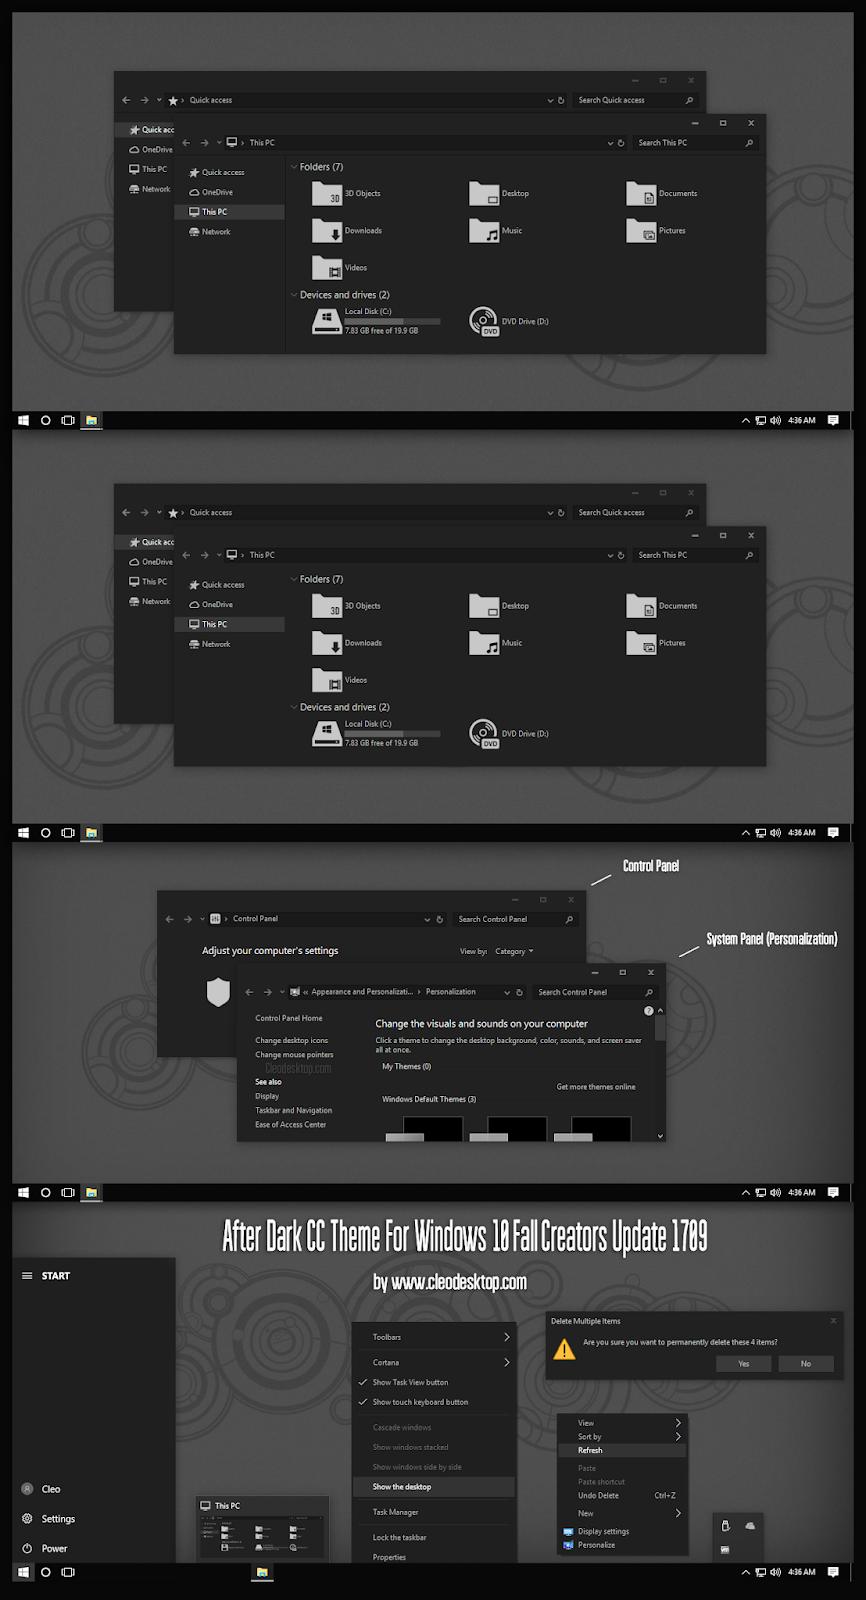 After Dark CC Theme For Windows10 Fall Creators Update 1709